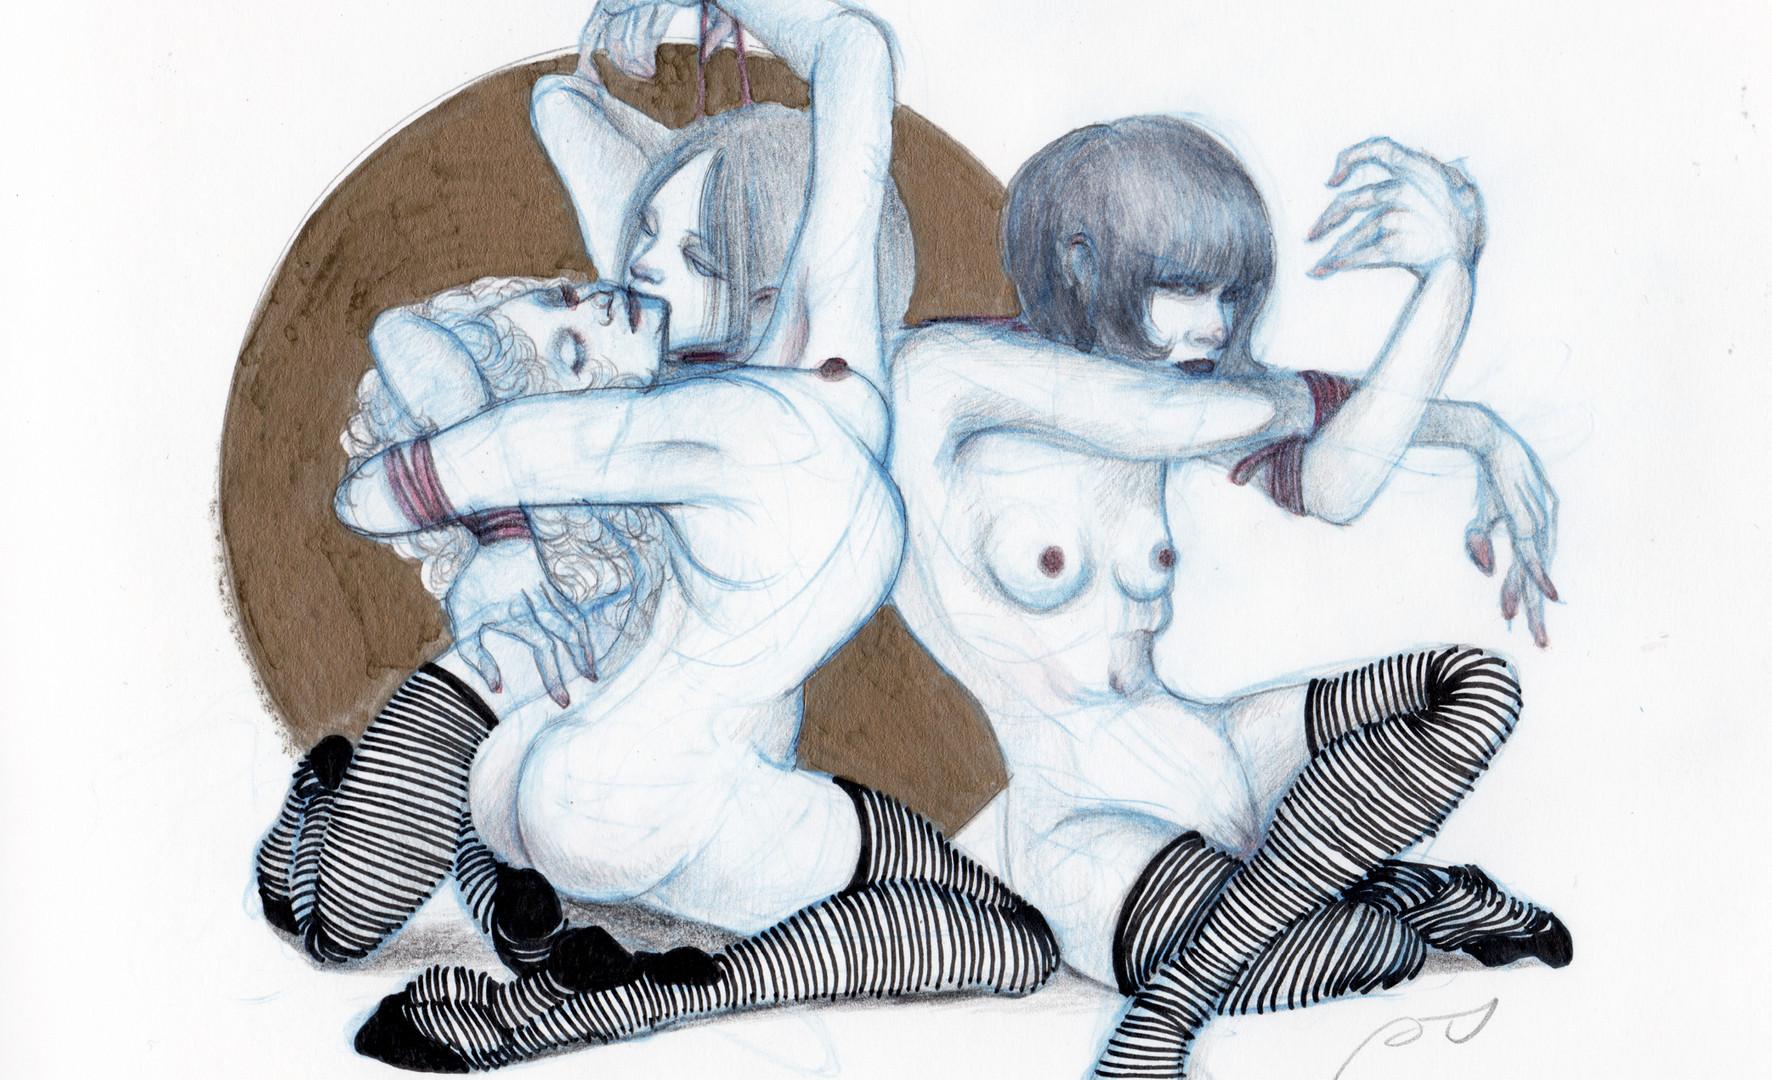 Polly_Lin-boudoir-pencil&inkOnPaper-11x11.jpg